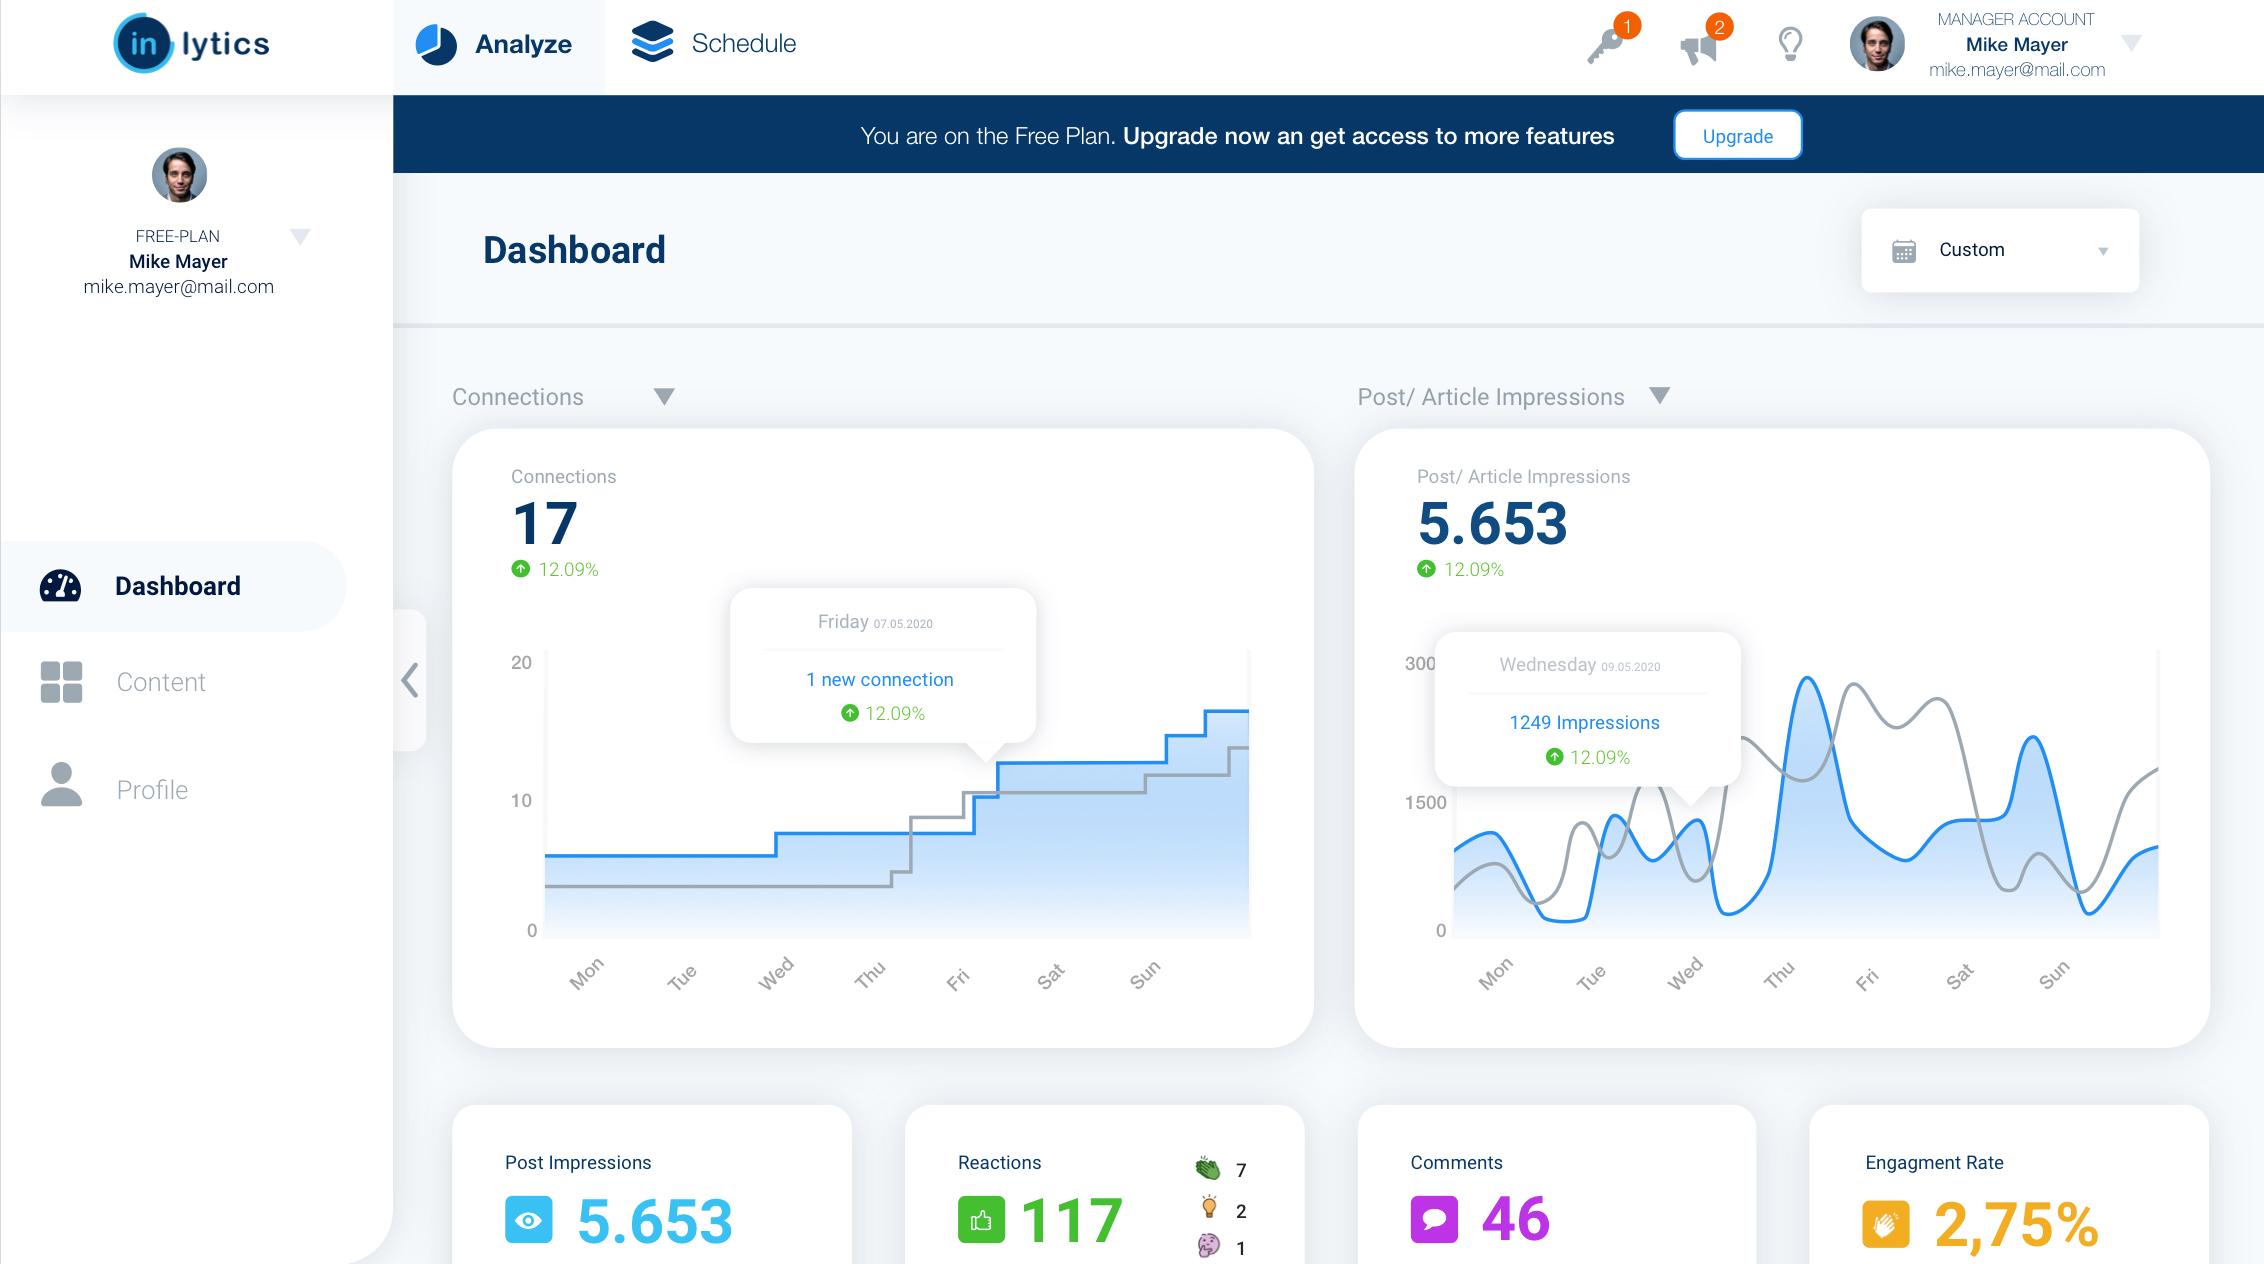 inlytics free plan dashboard